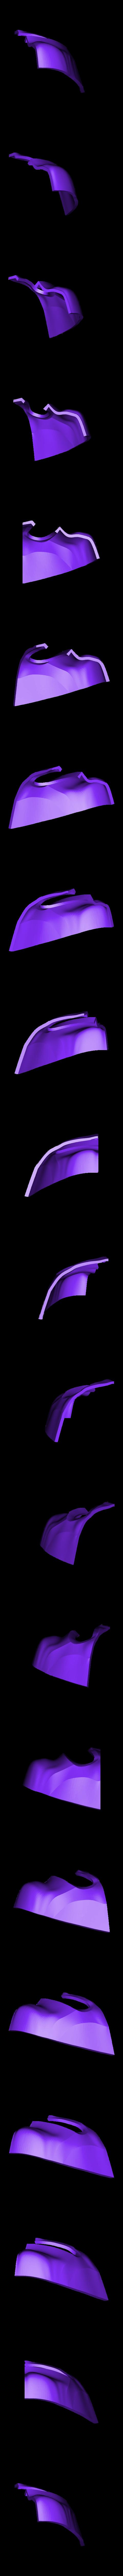 Part_6.stl Download free STL file Samurai Half Mask (Mempo) • Model to 3D print, VillainousPropShop